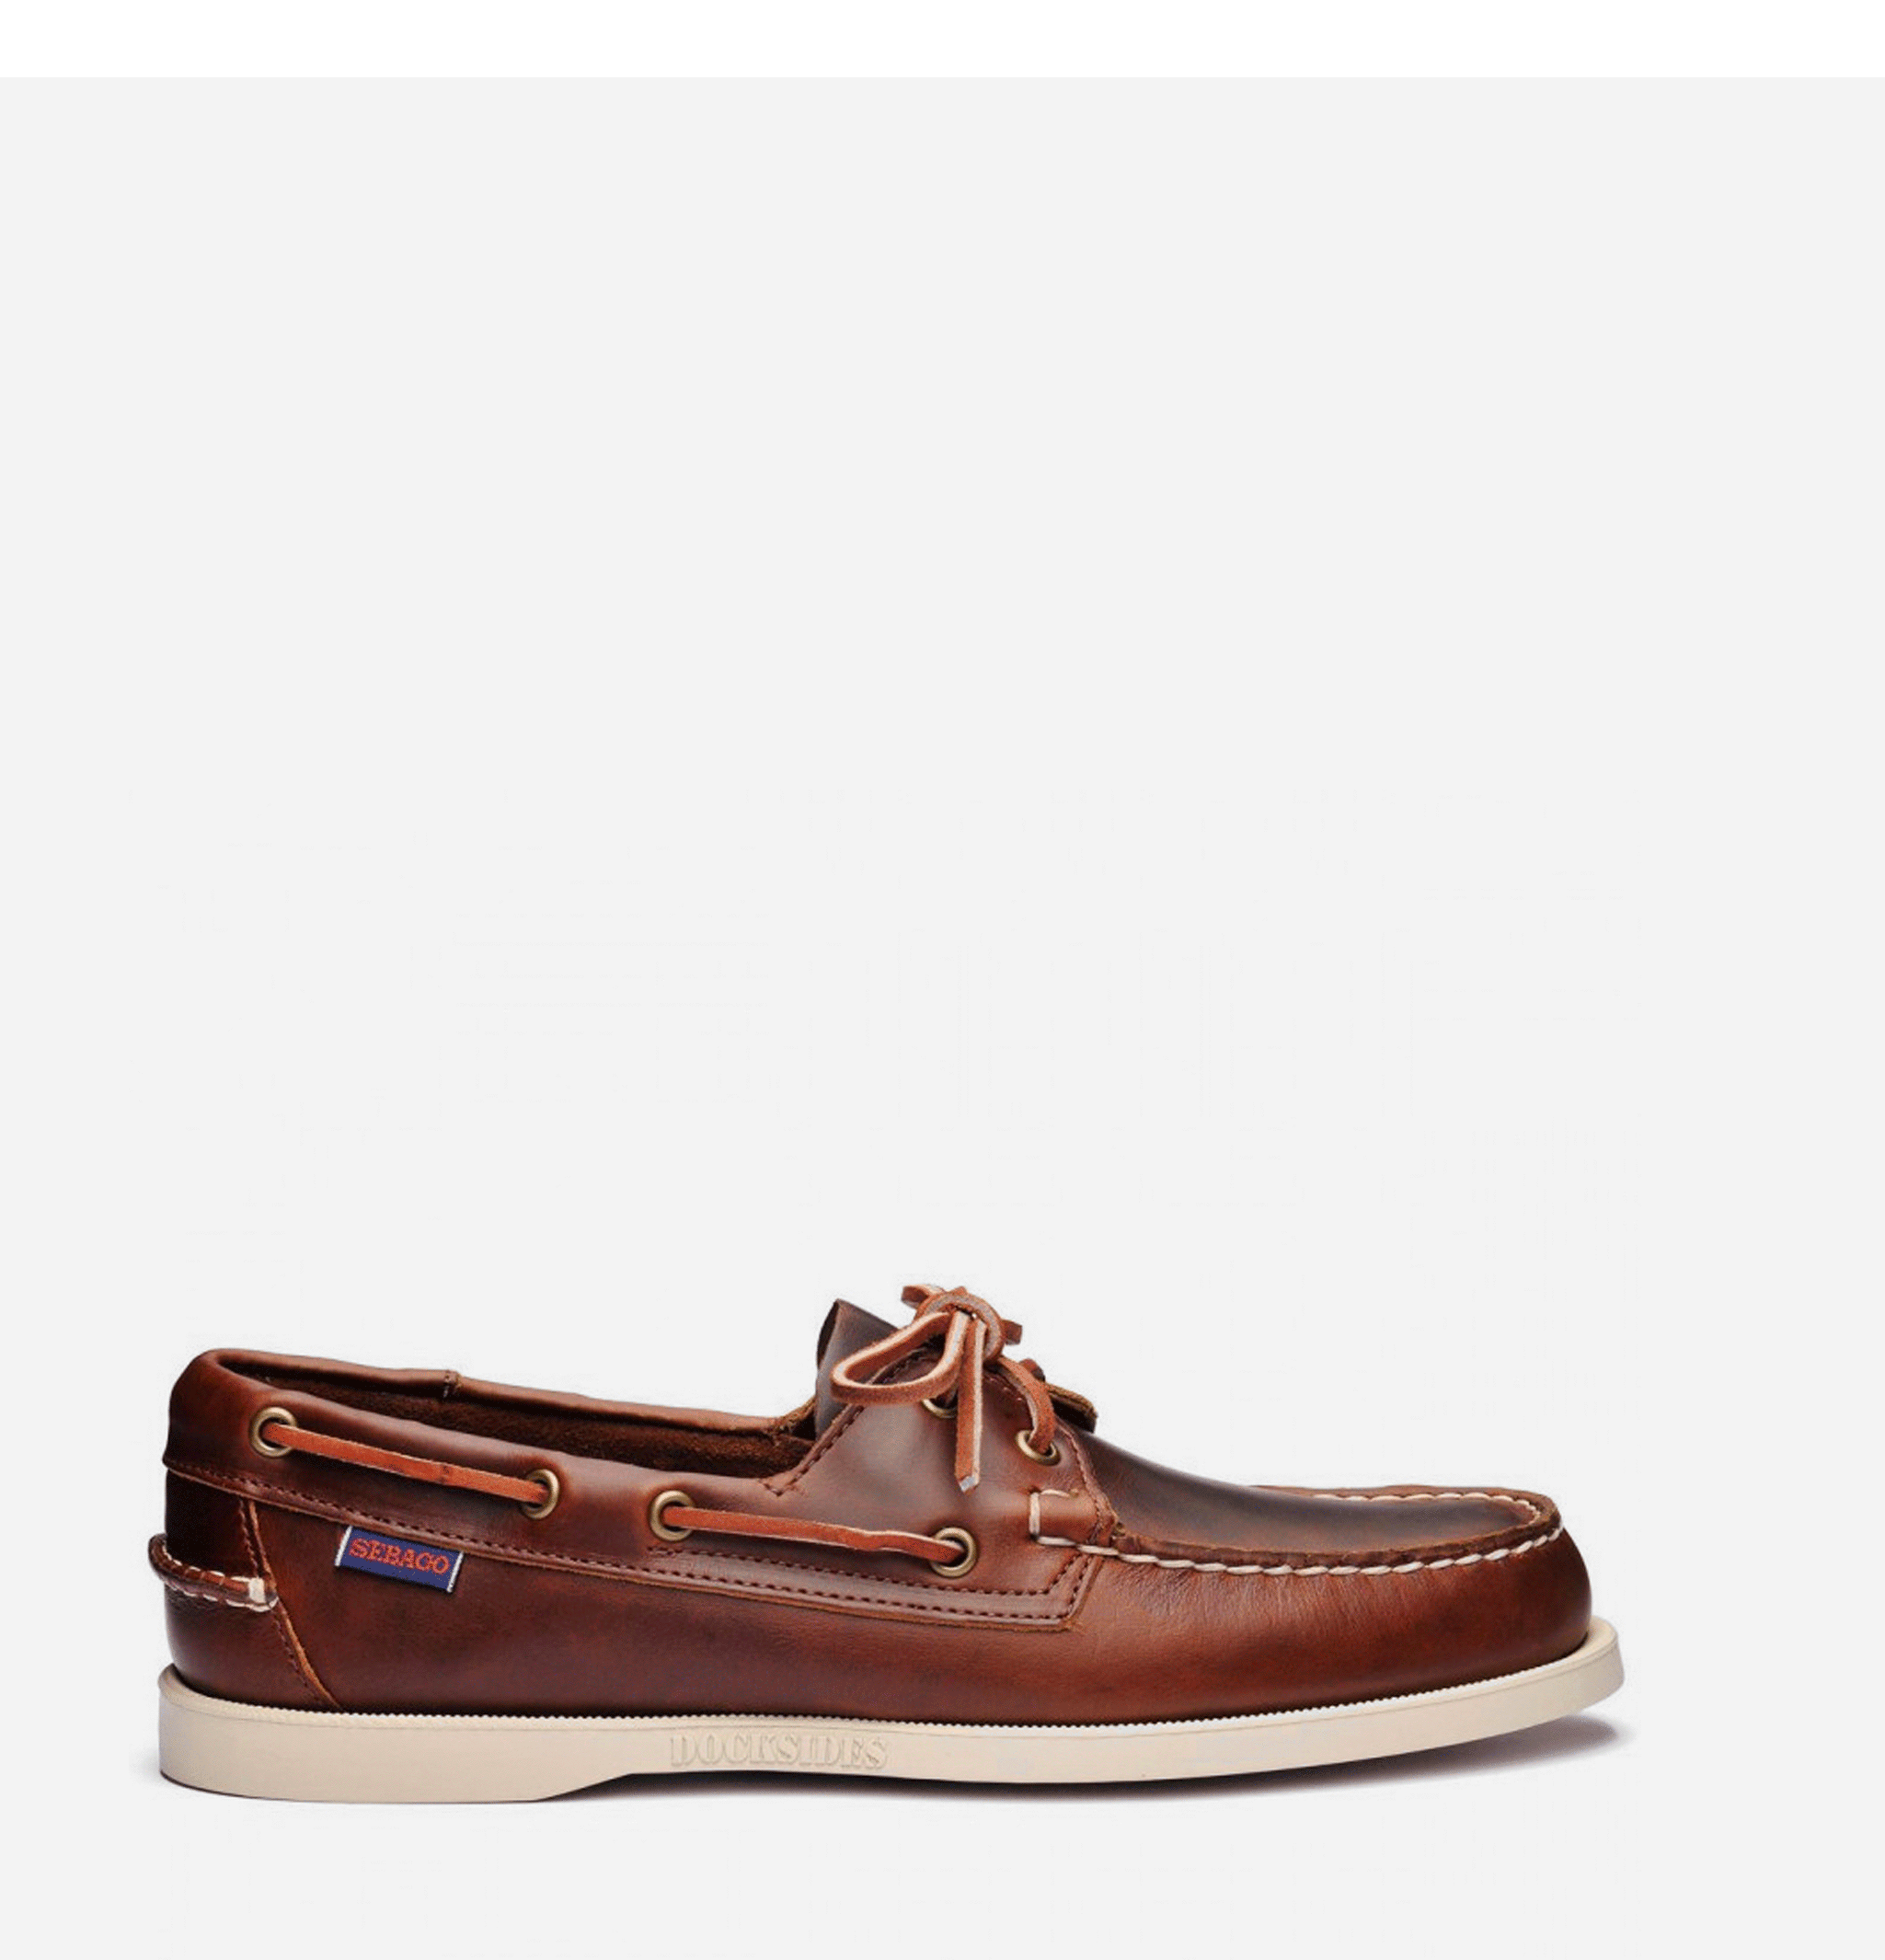 Docksides Shoes Dark Brown